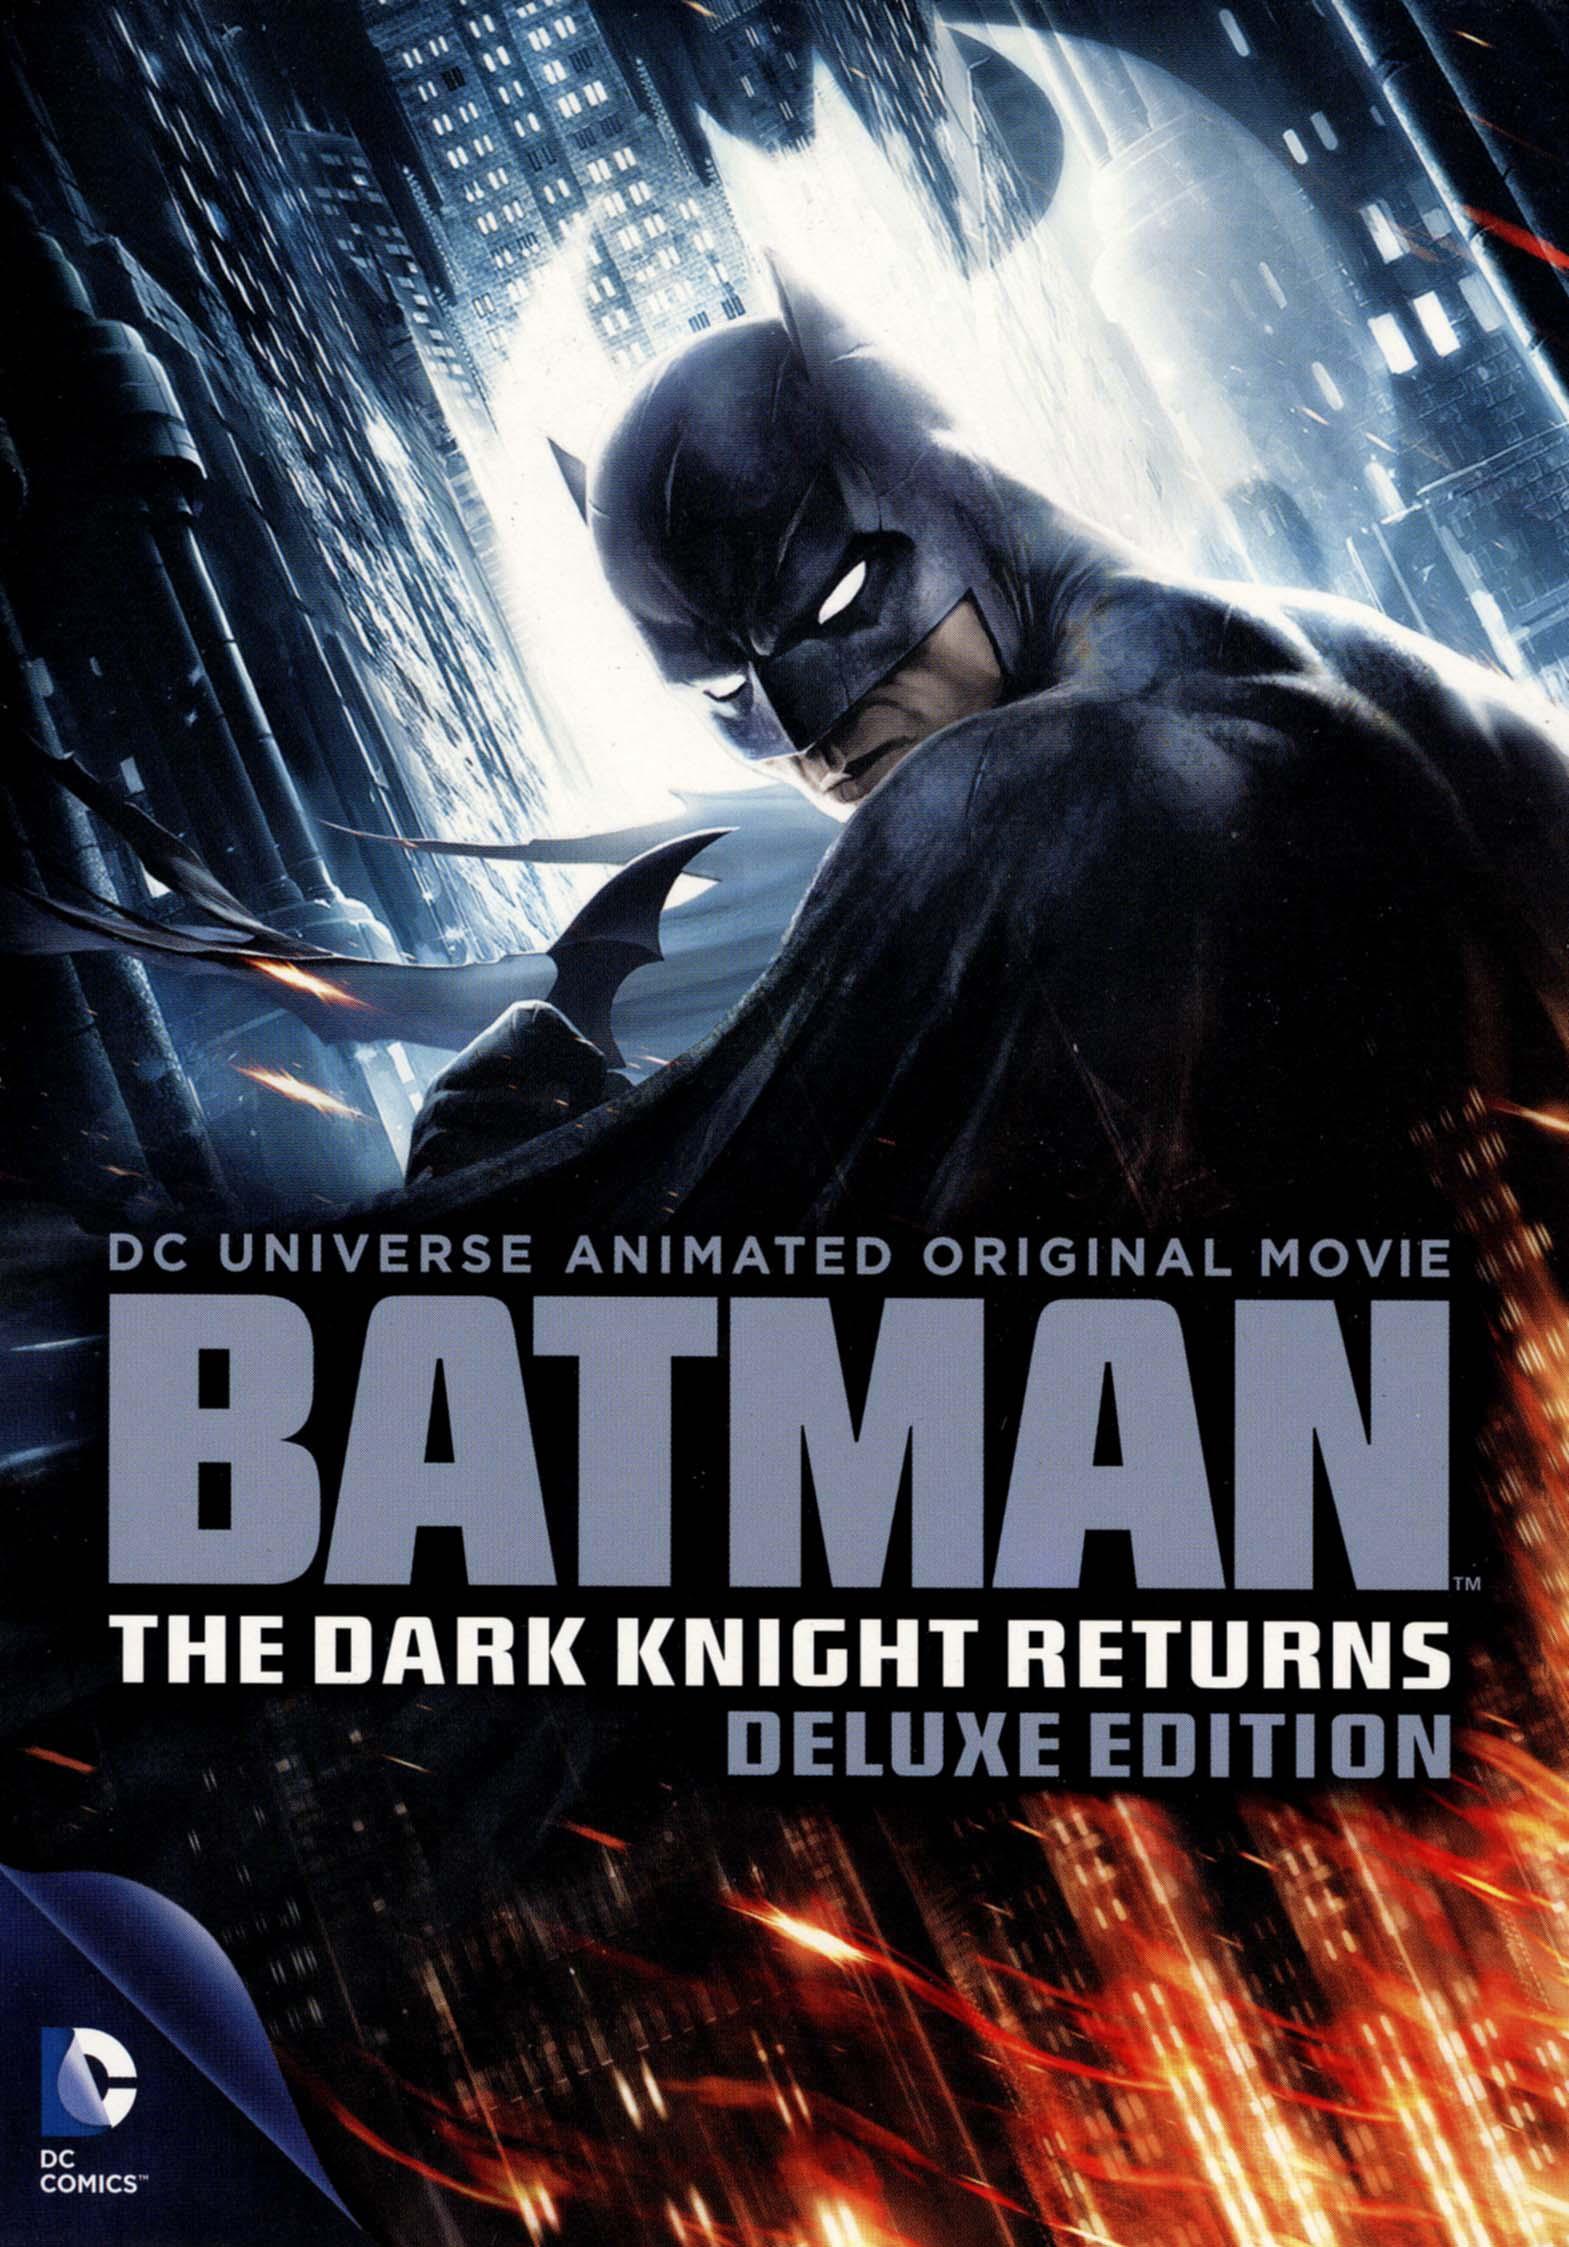 Batman: The Dark Knight Returns [deluxe Edition] [2 Discs] (dvd) 21646107